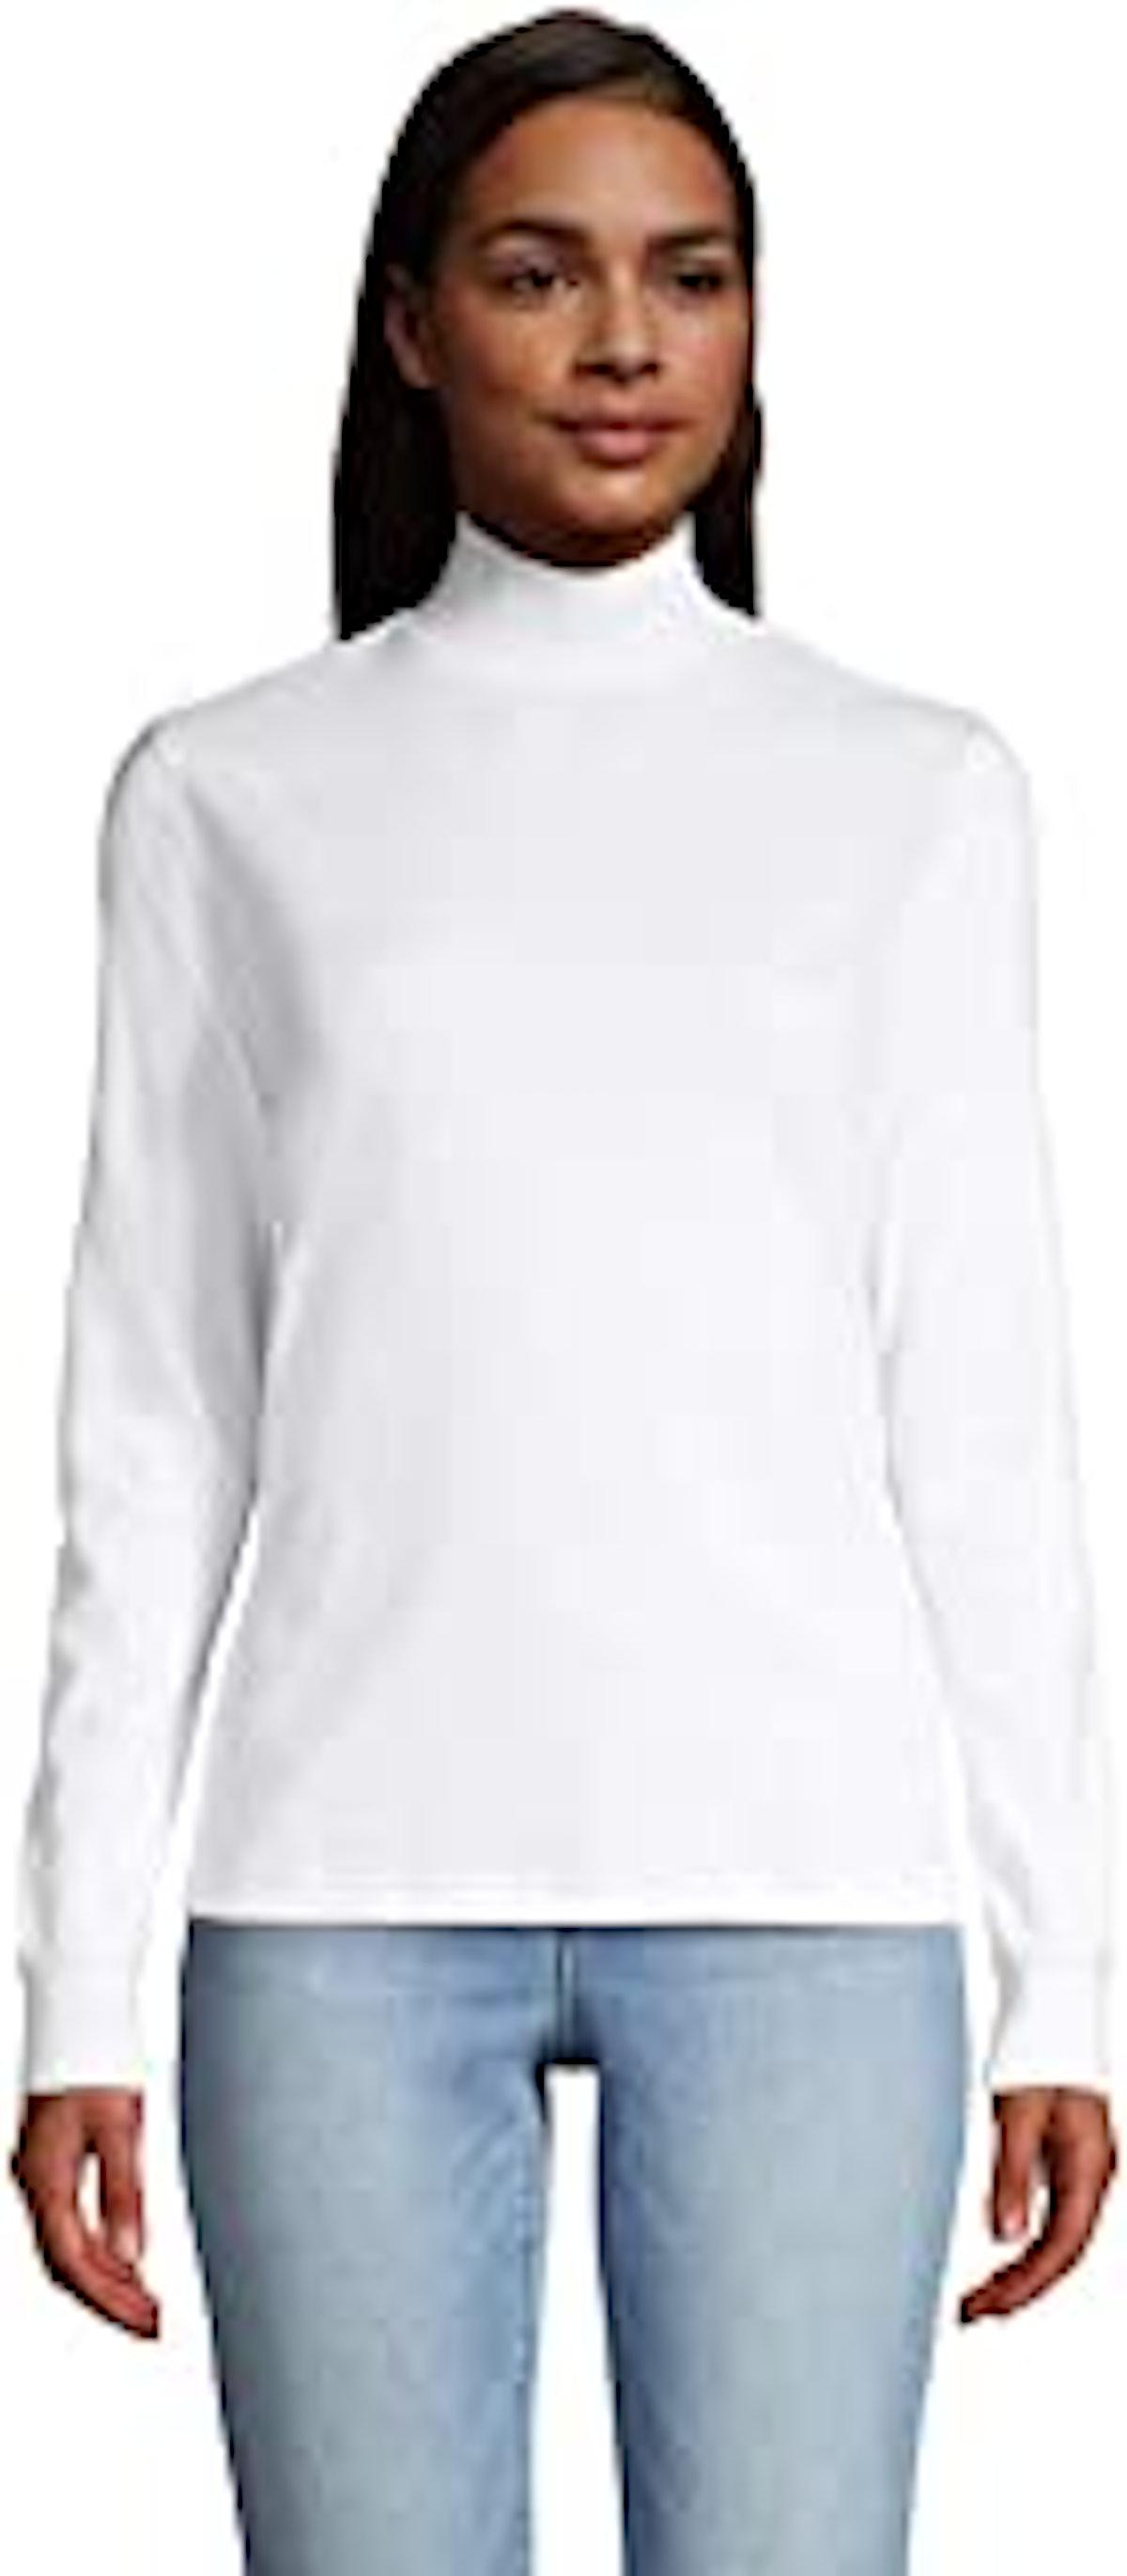 Lands' End Women's Relaxed Cotton Long Sleeve Mock Turtleneck